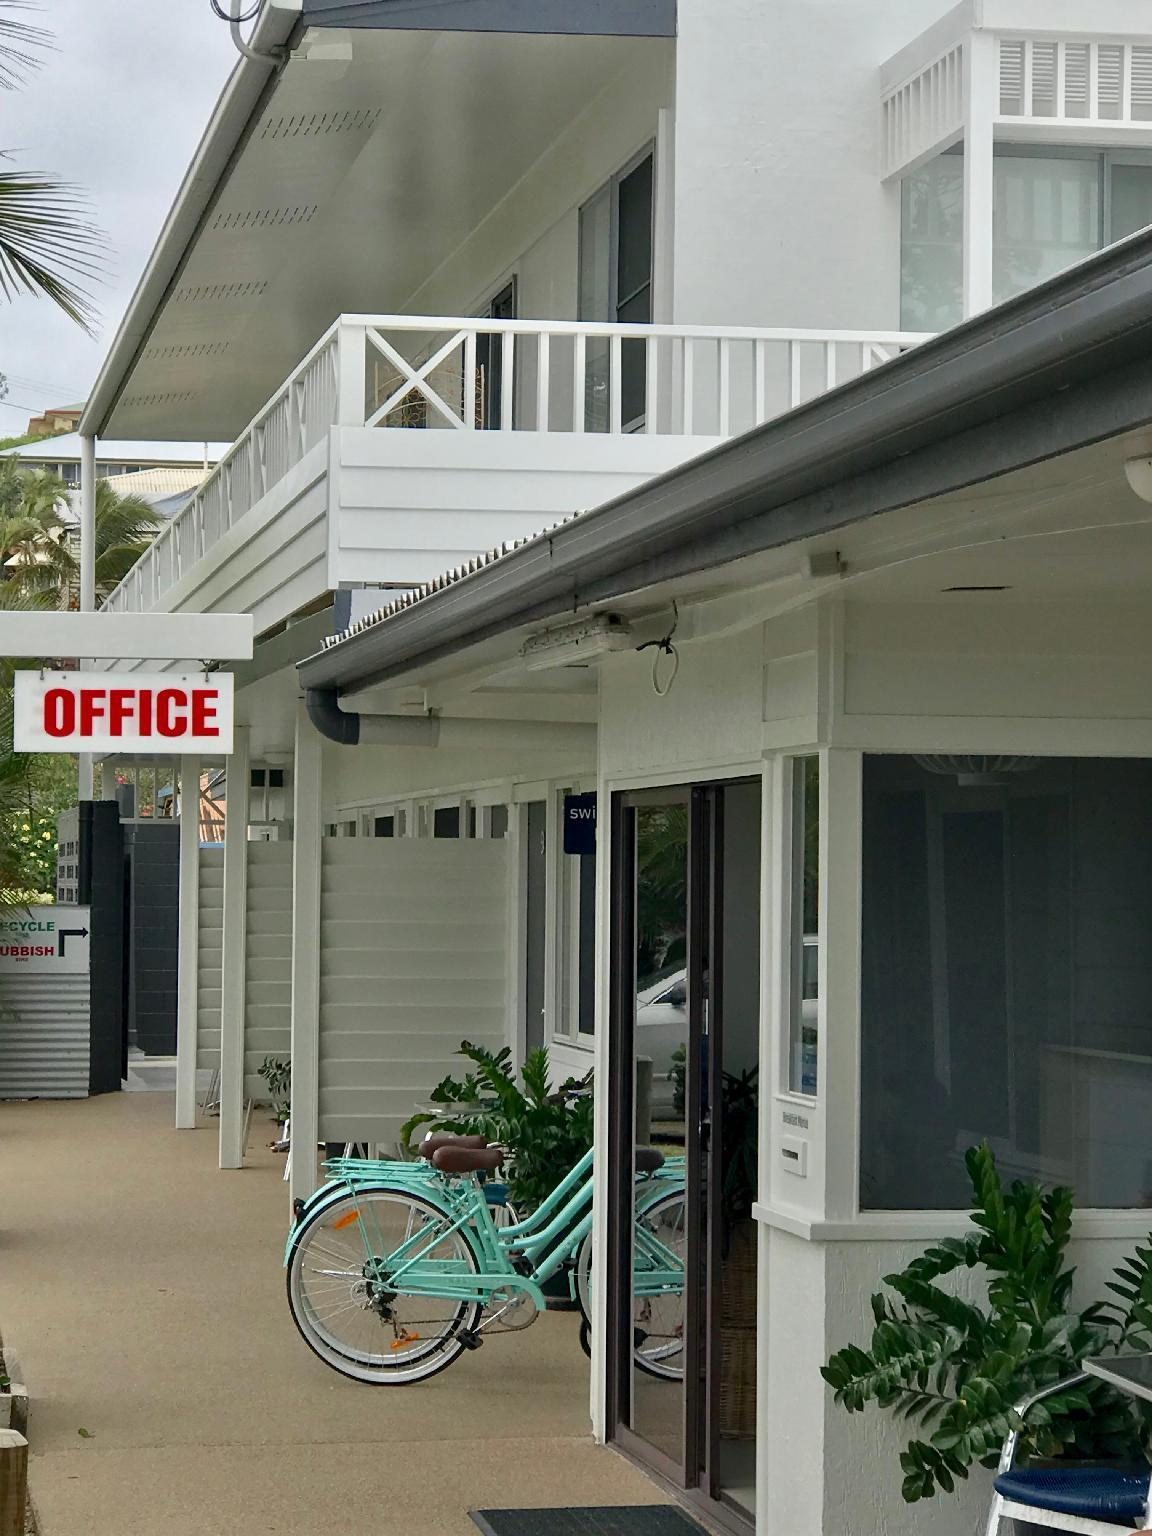 Yeppoon Surfside Motel